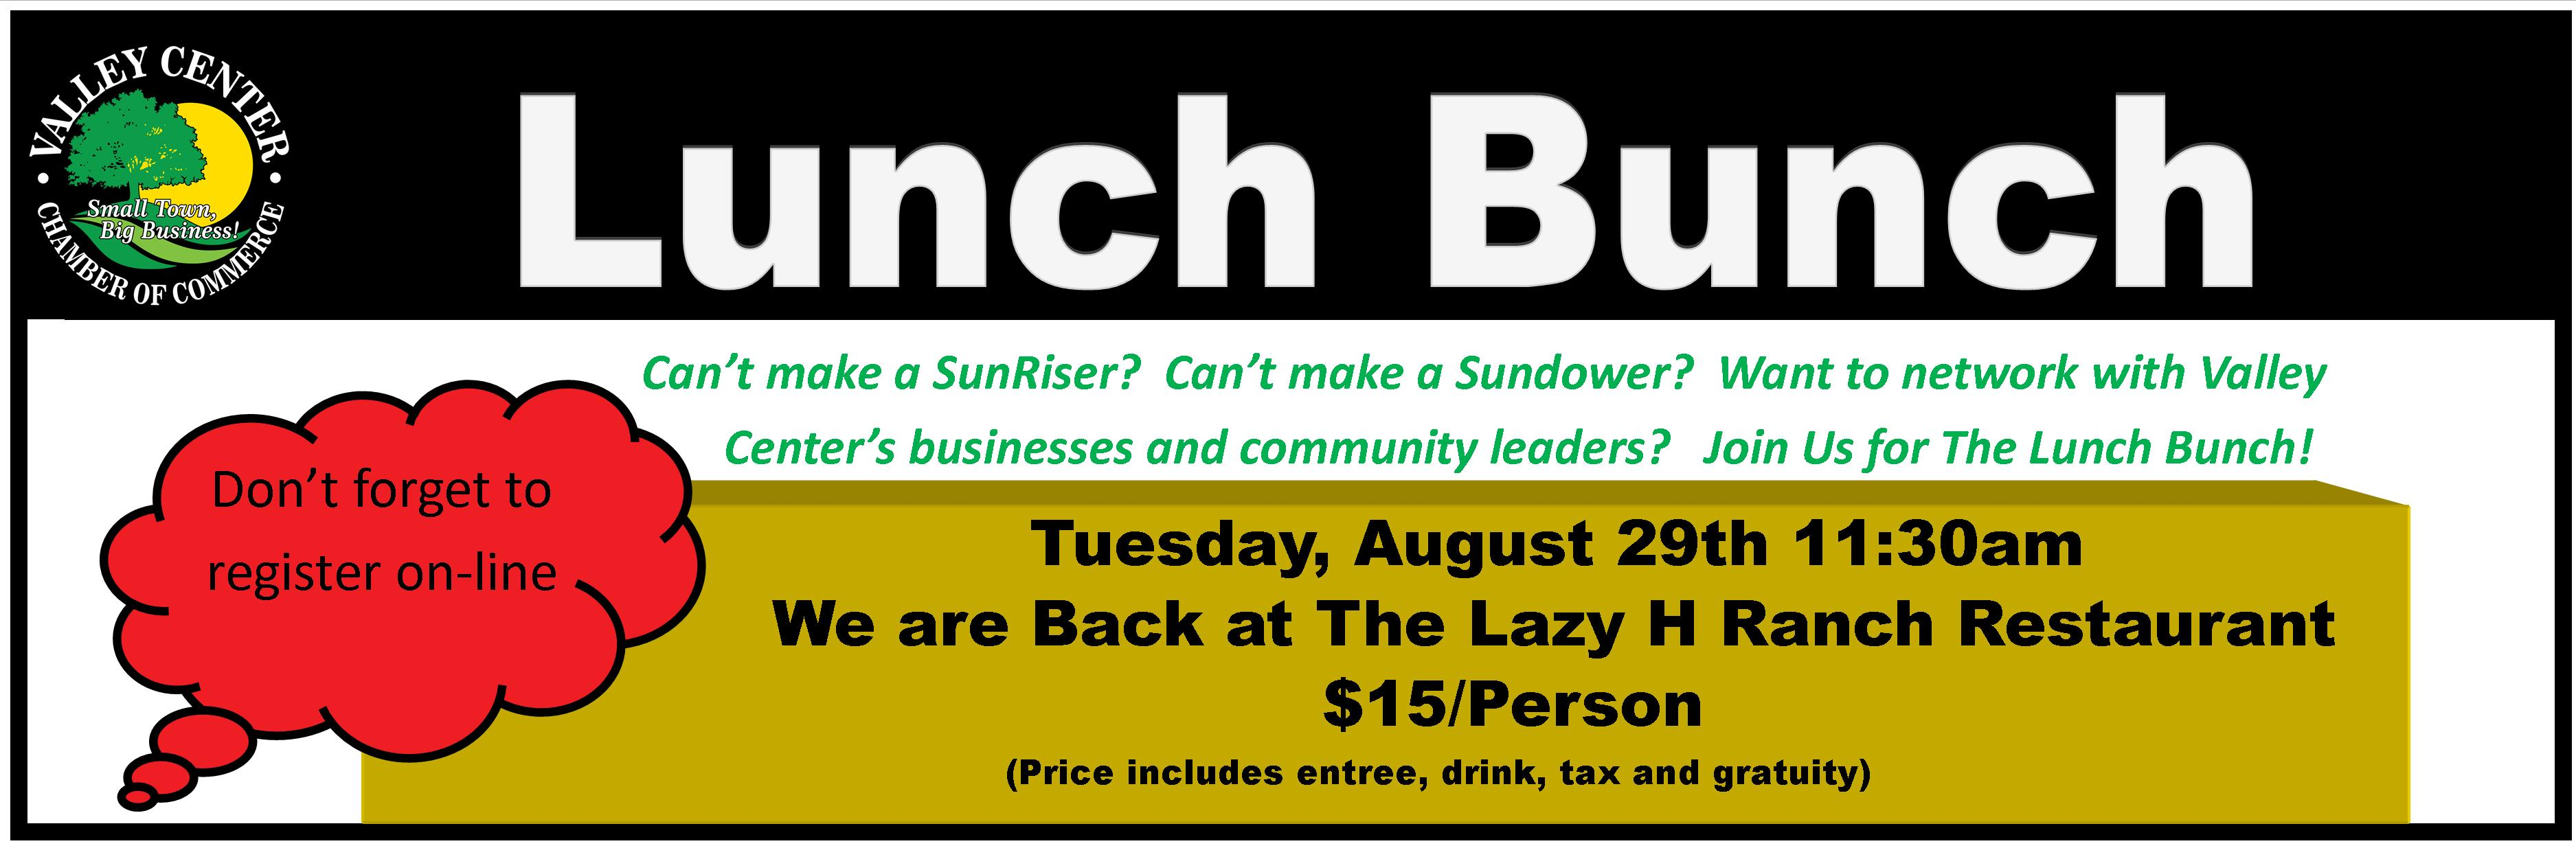 Lunch-Bunch-Lazy-H-July(1).jpg